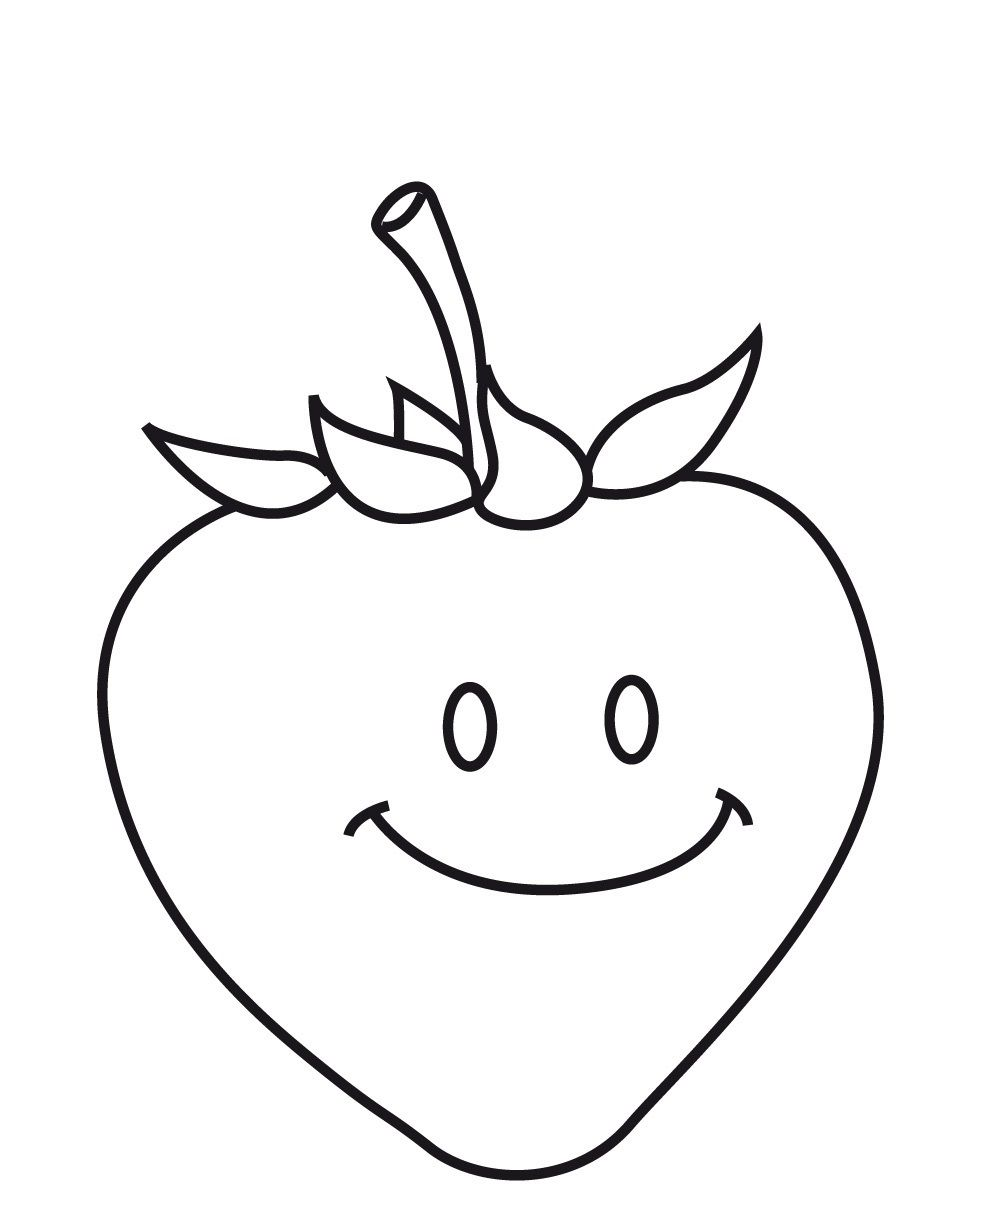 Anasinifi Cilek Boyama Sayfasi 1 Fruit Coloring Pages